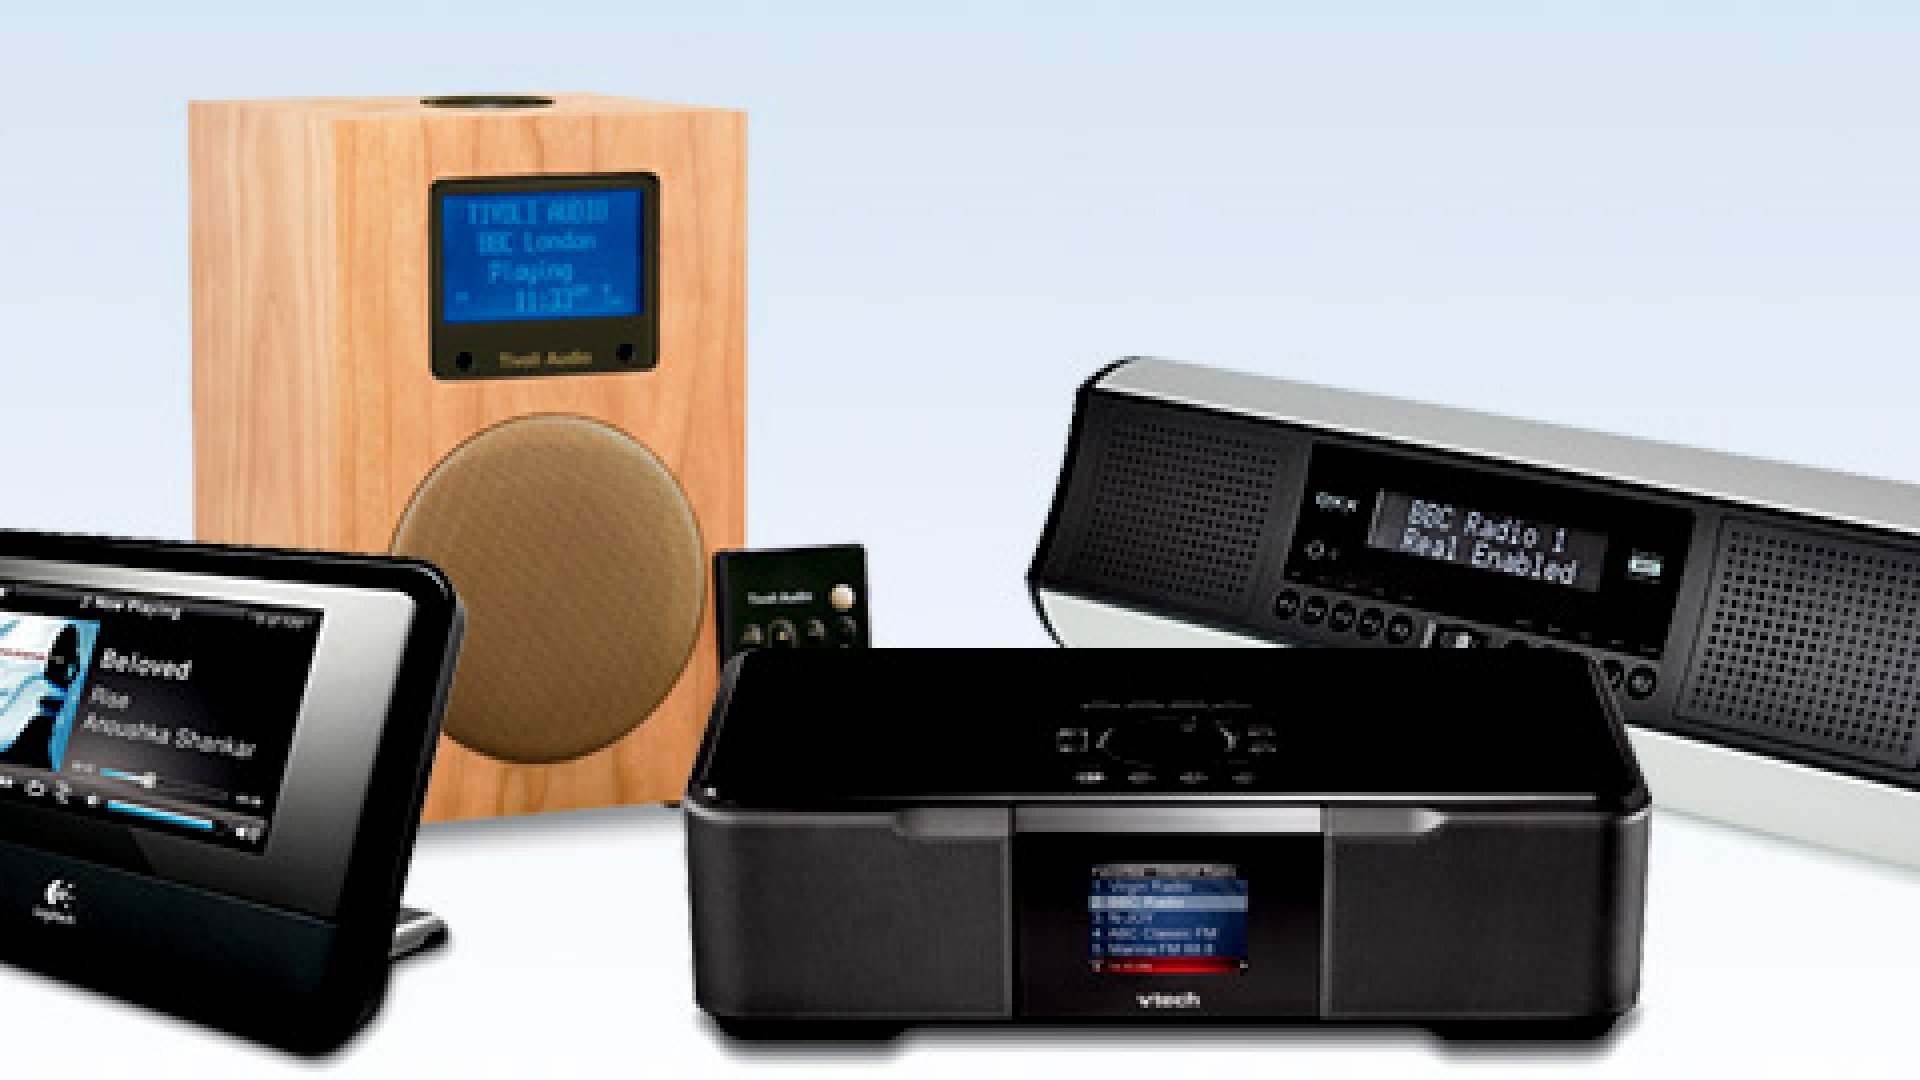 The Best New Wi-Fi Radios